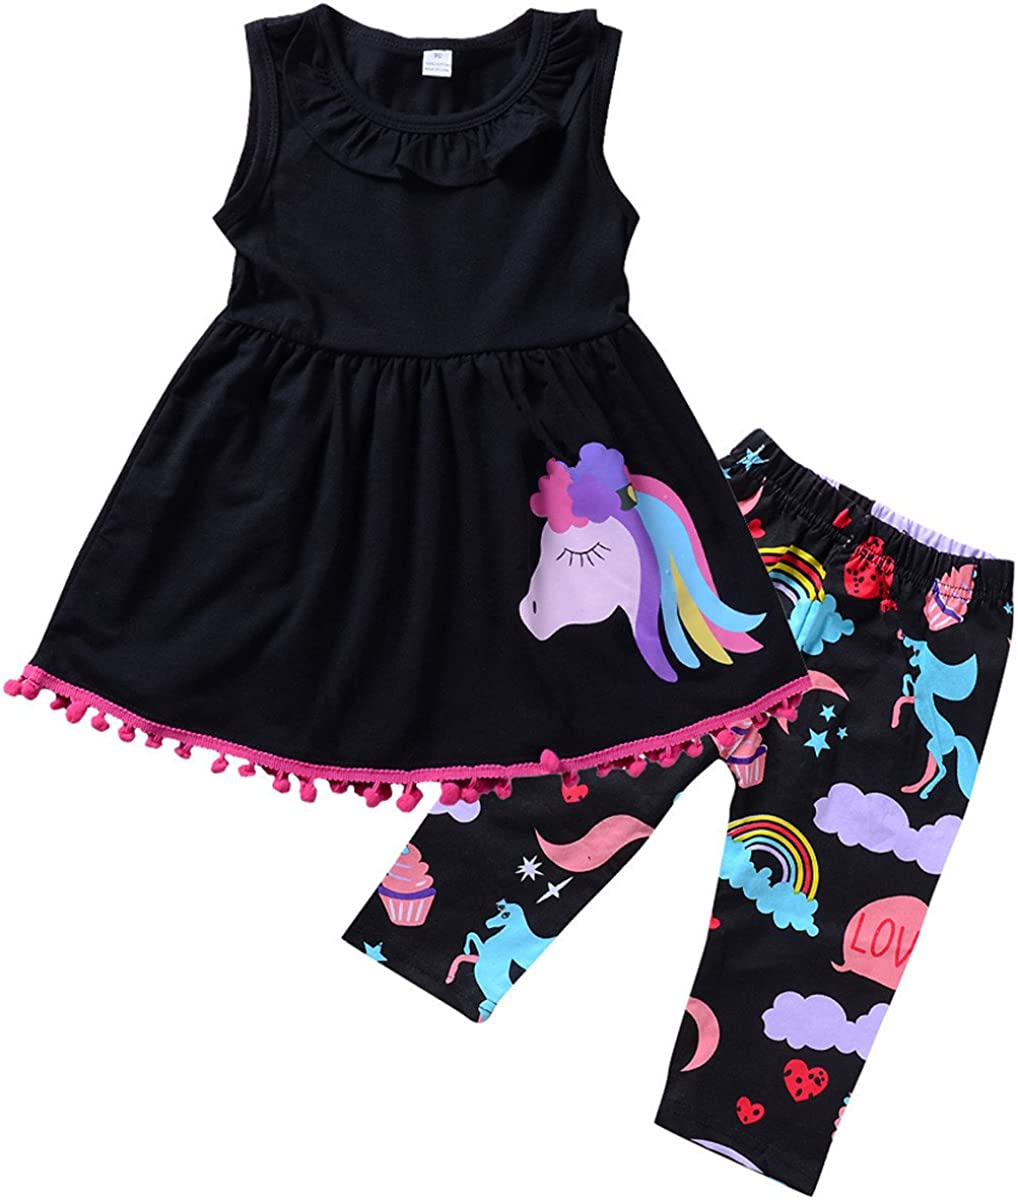 Baby Toddler Girls Tassel Sleeveless Ruffle Shirt Dress Cropped Pants Outfit Set